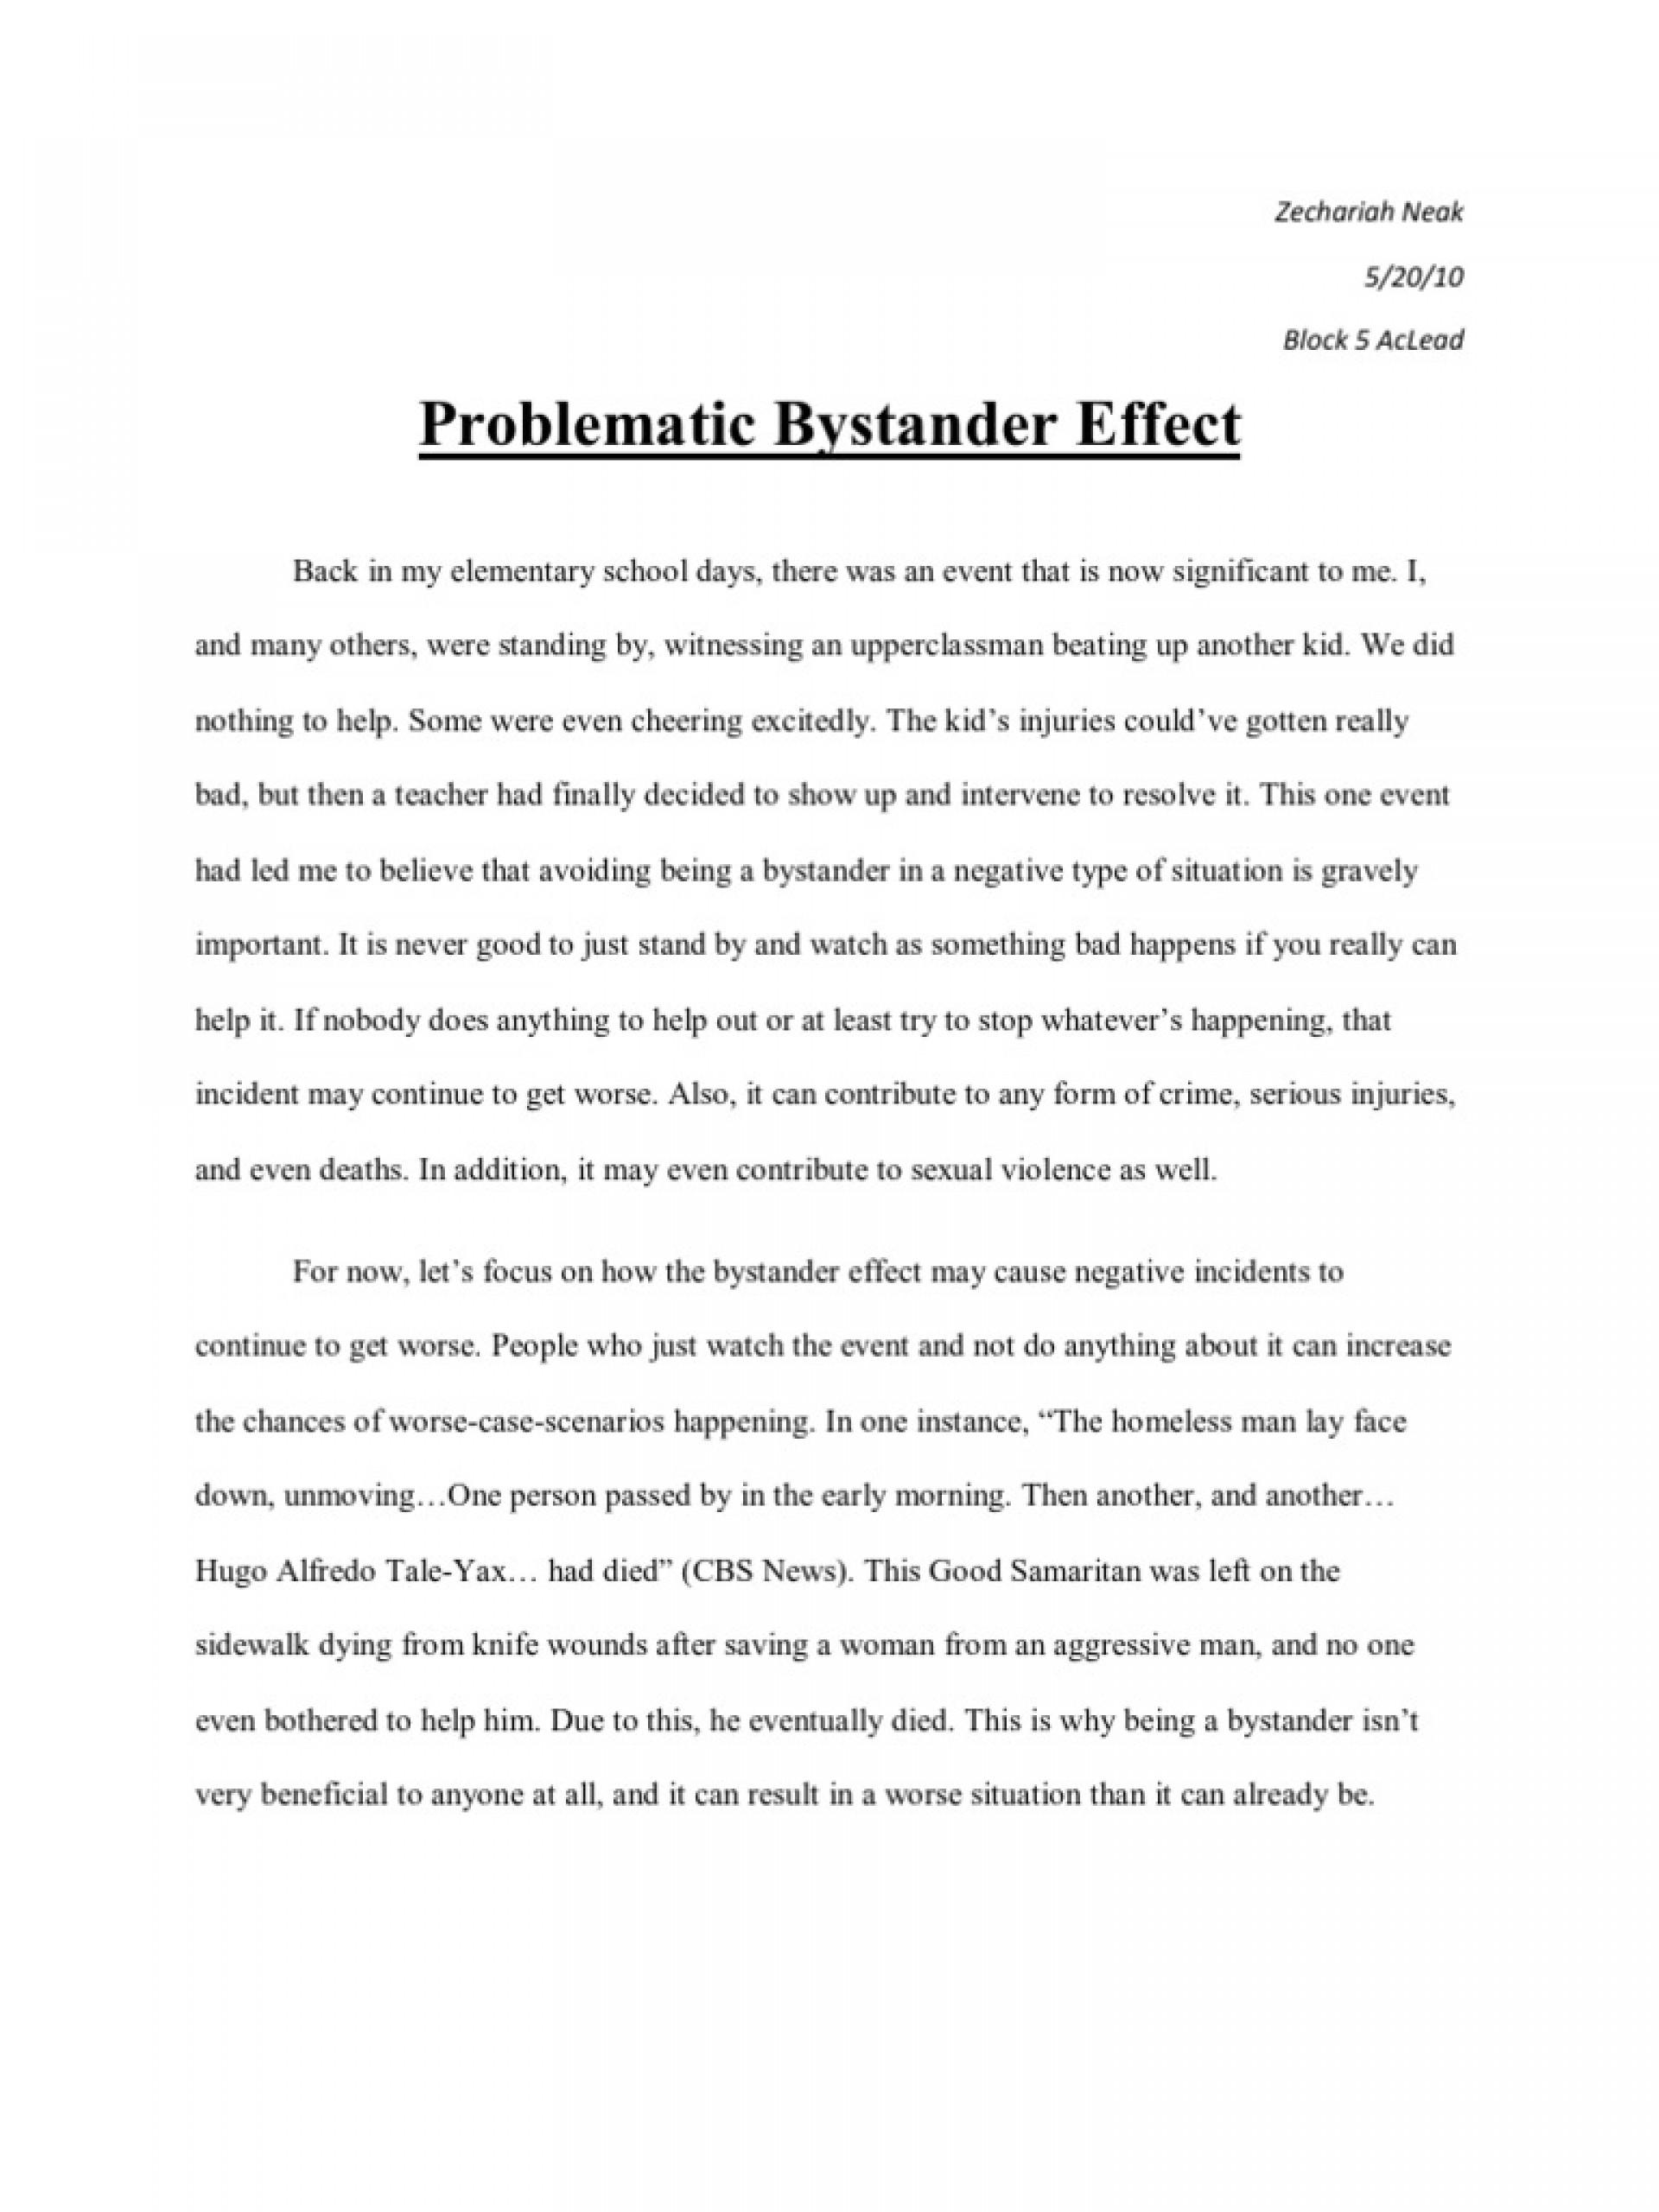 001 The Wife Beater Essay 2798300303 On Beating Stunning Summary Analysis 1920